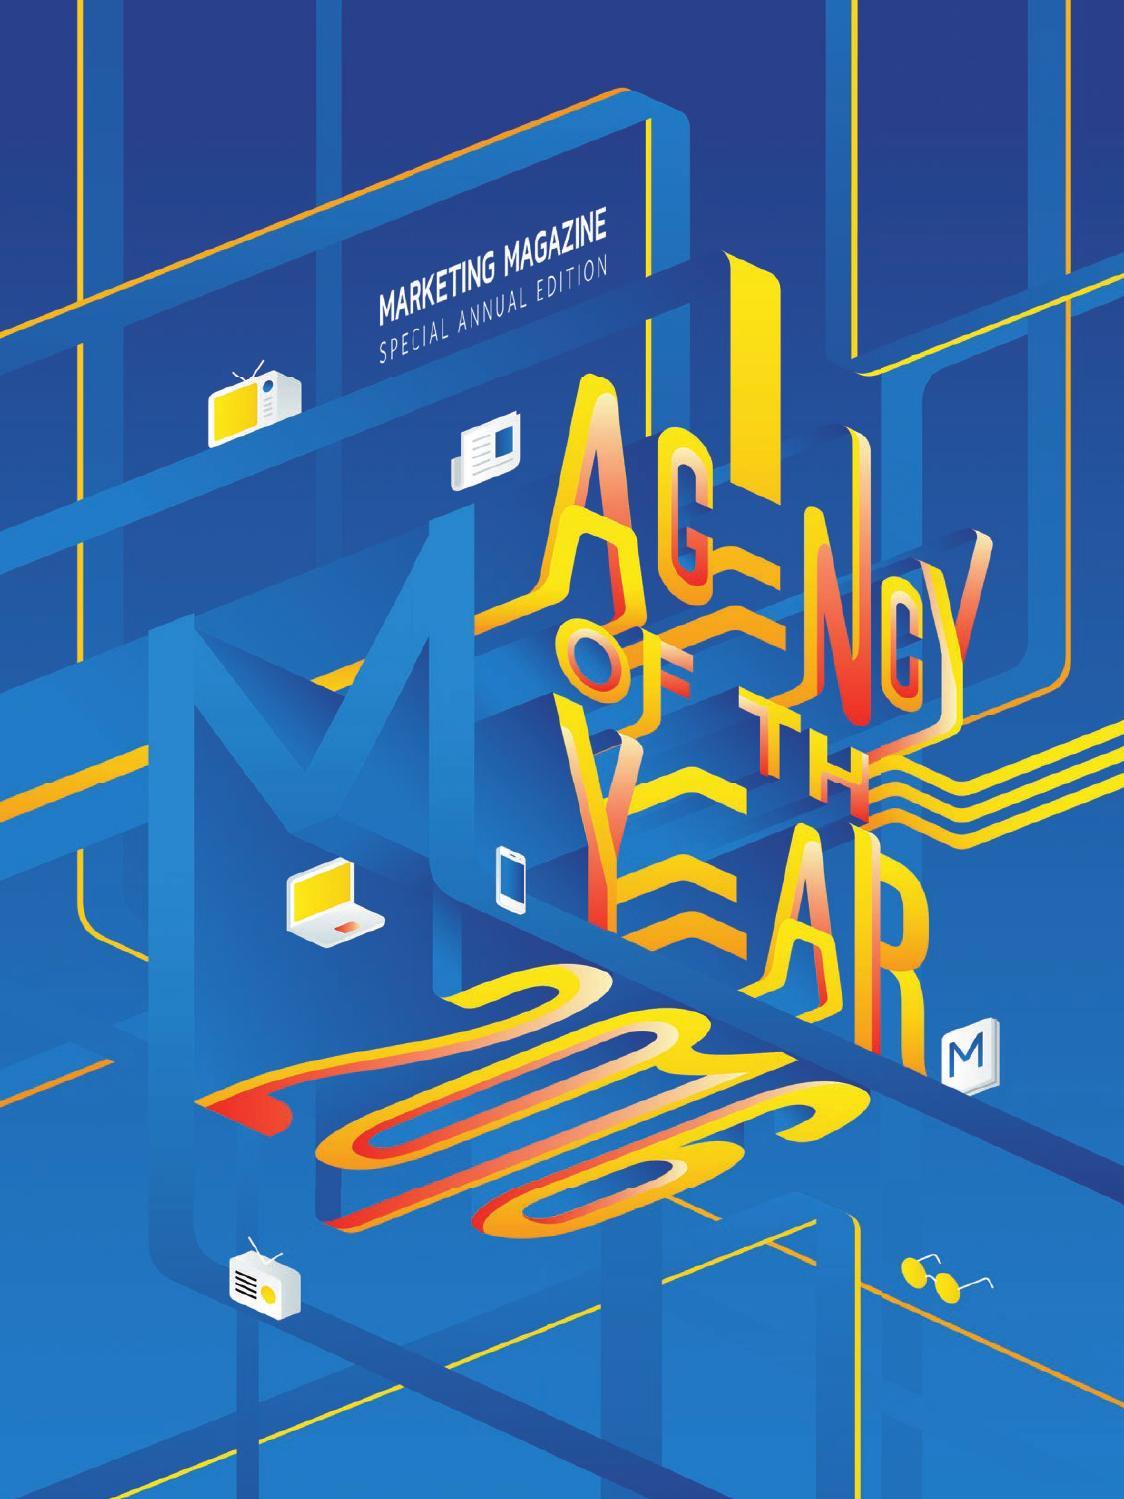 Marketing Magazine SG - AOTY 2016 by Marketing Magazine